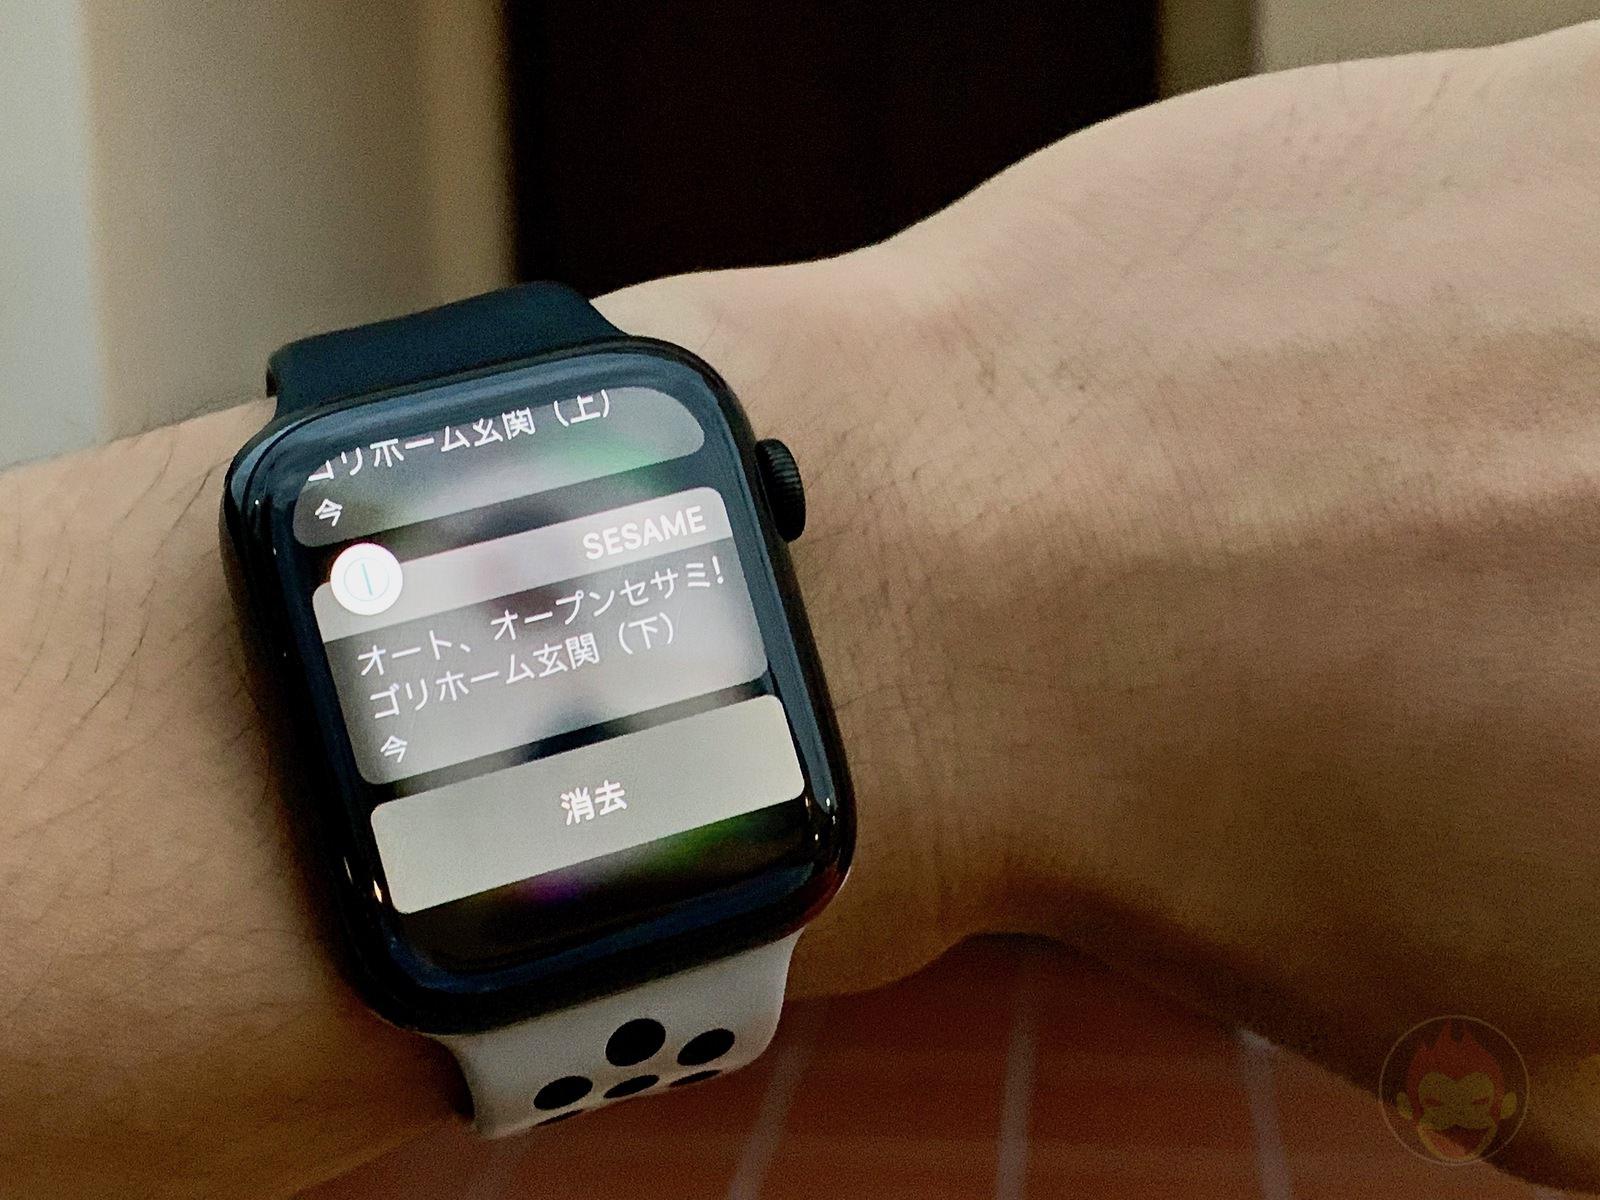 Smart-lock-sesame-mini-features-04.jpg